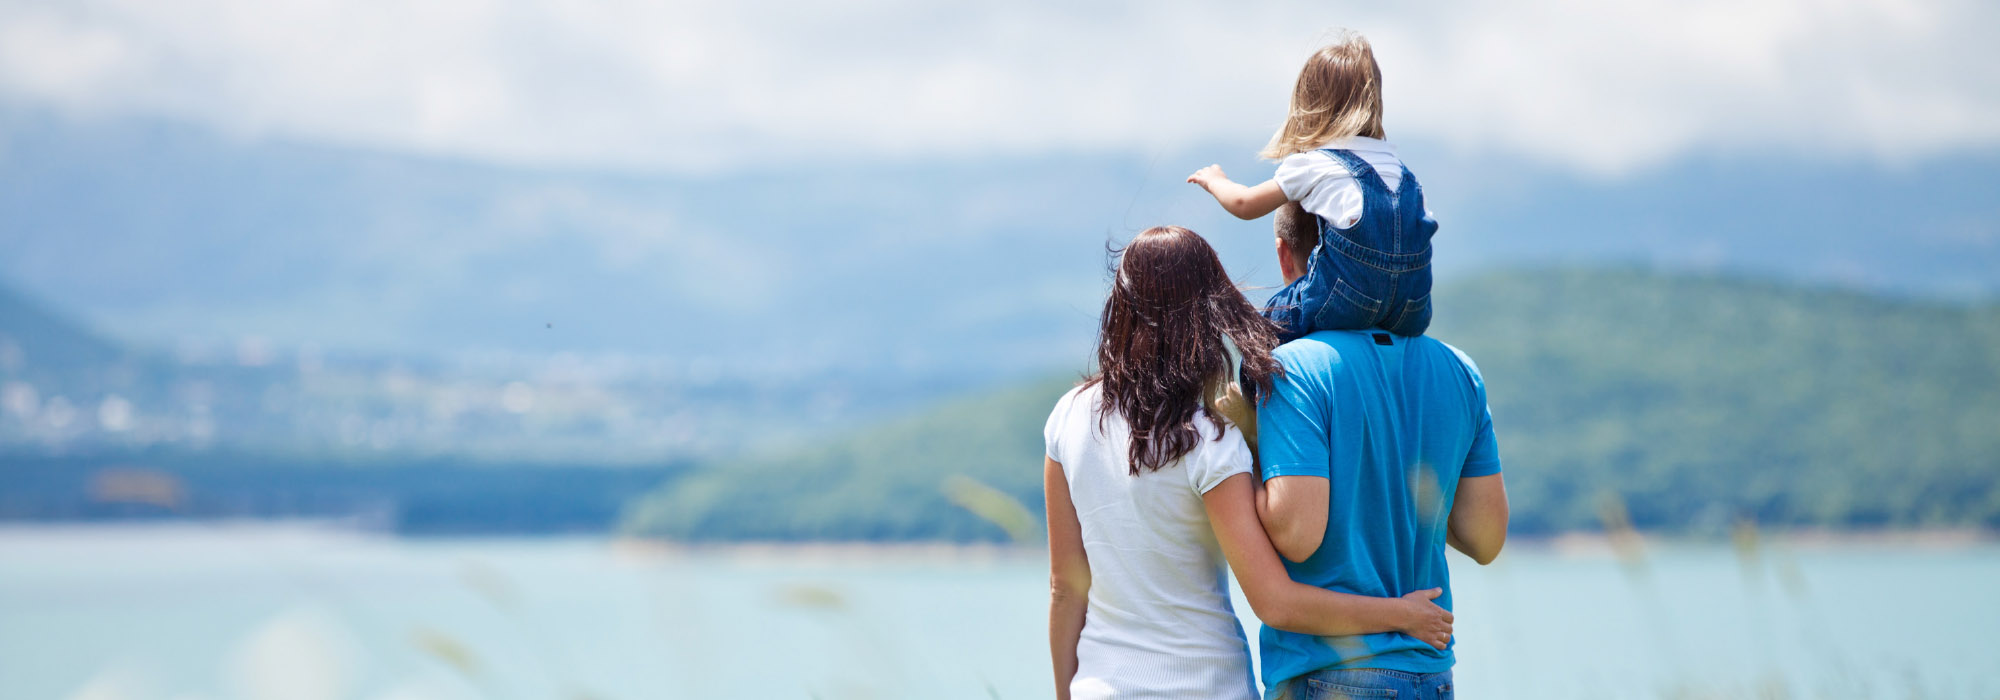 capricorn financial mortgage life protection